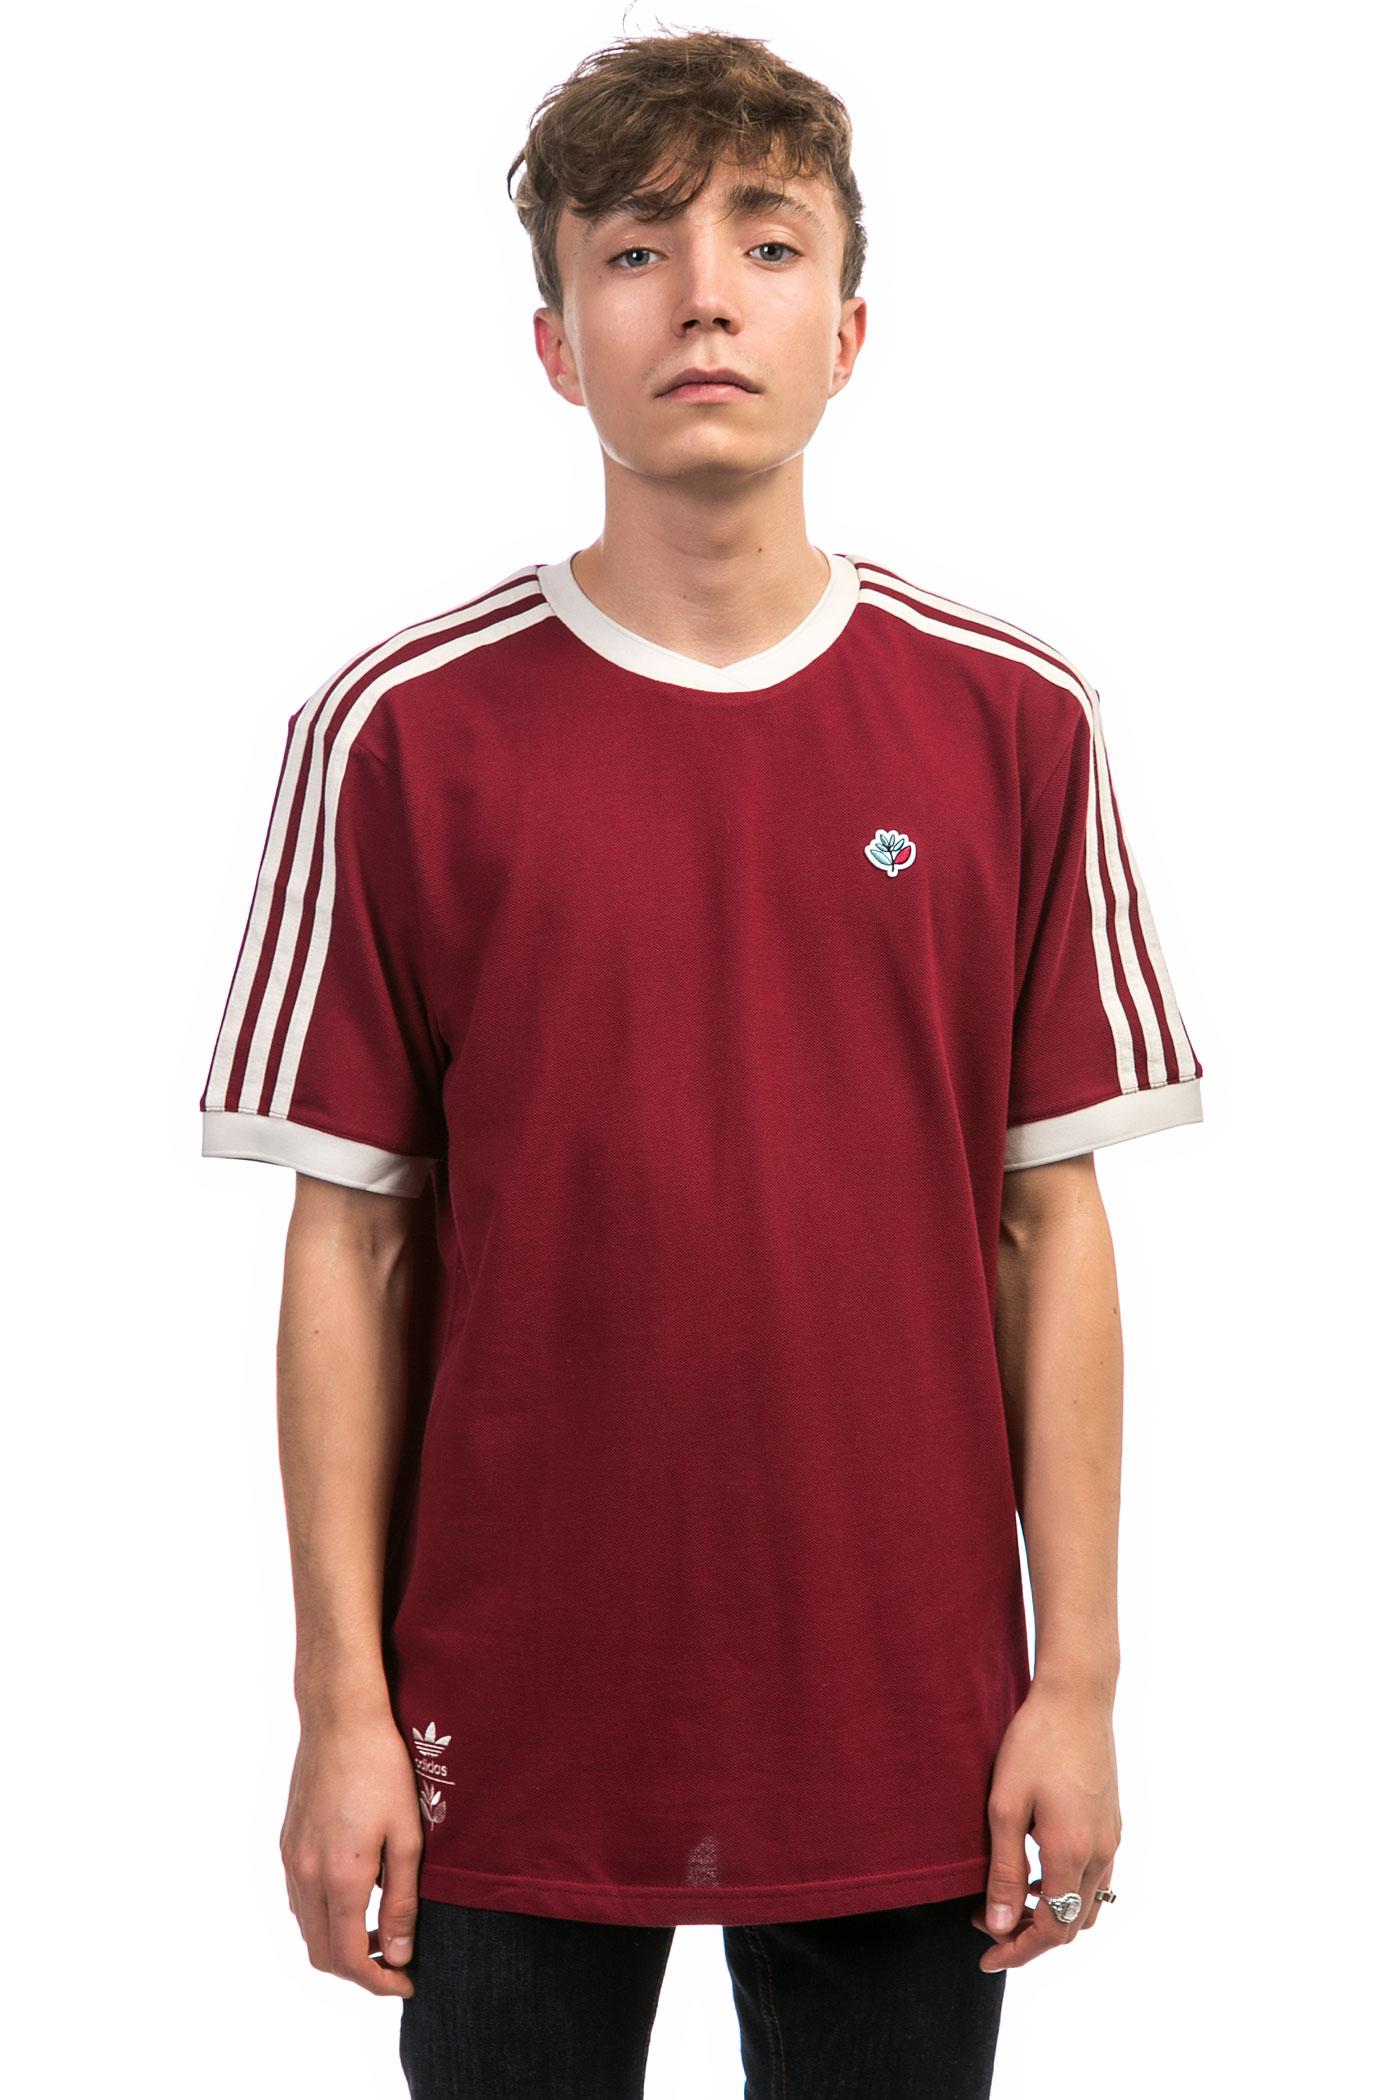 adidas x magenta collab jersey t shirt burgundy brown buy at skatedeluxe. Black Bedroom Furniture Sets. Home Design Ideas